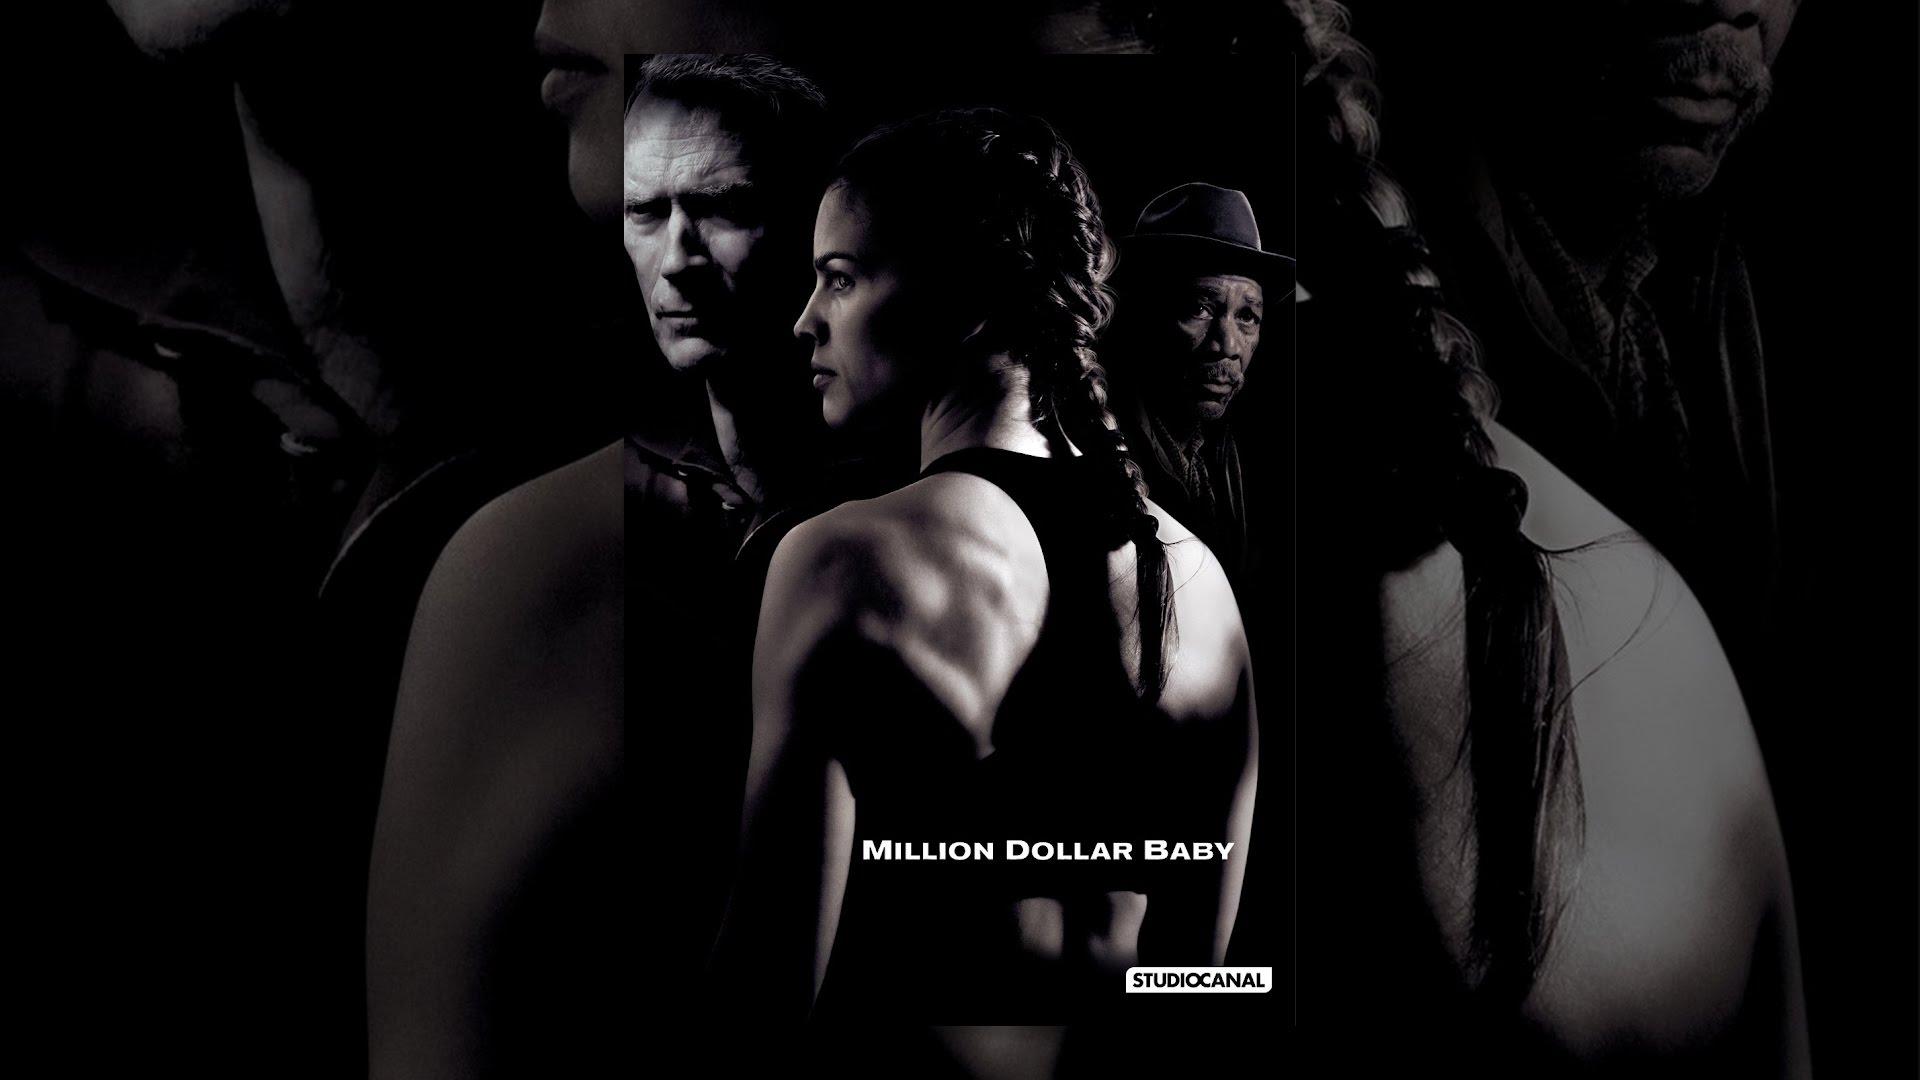 Million Dollar Baby (VF)